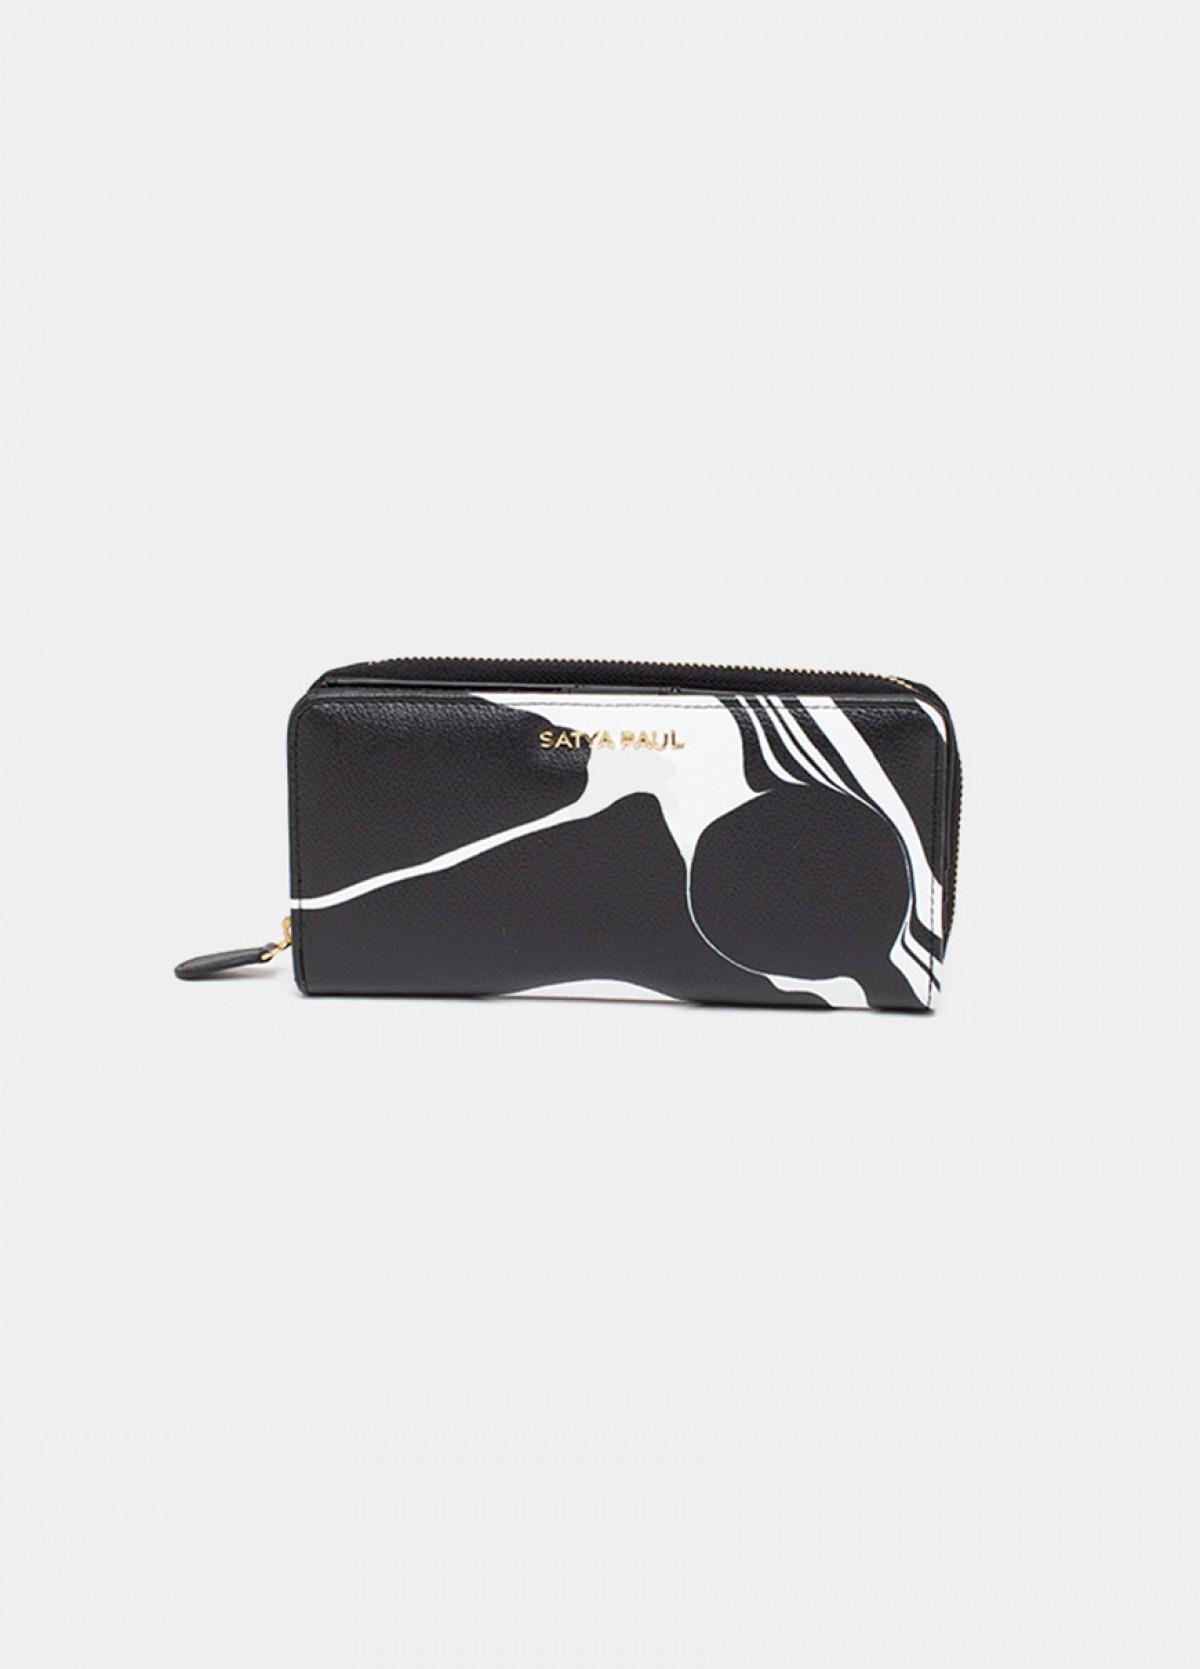 The Furano Wallet